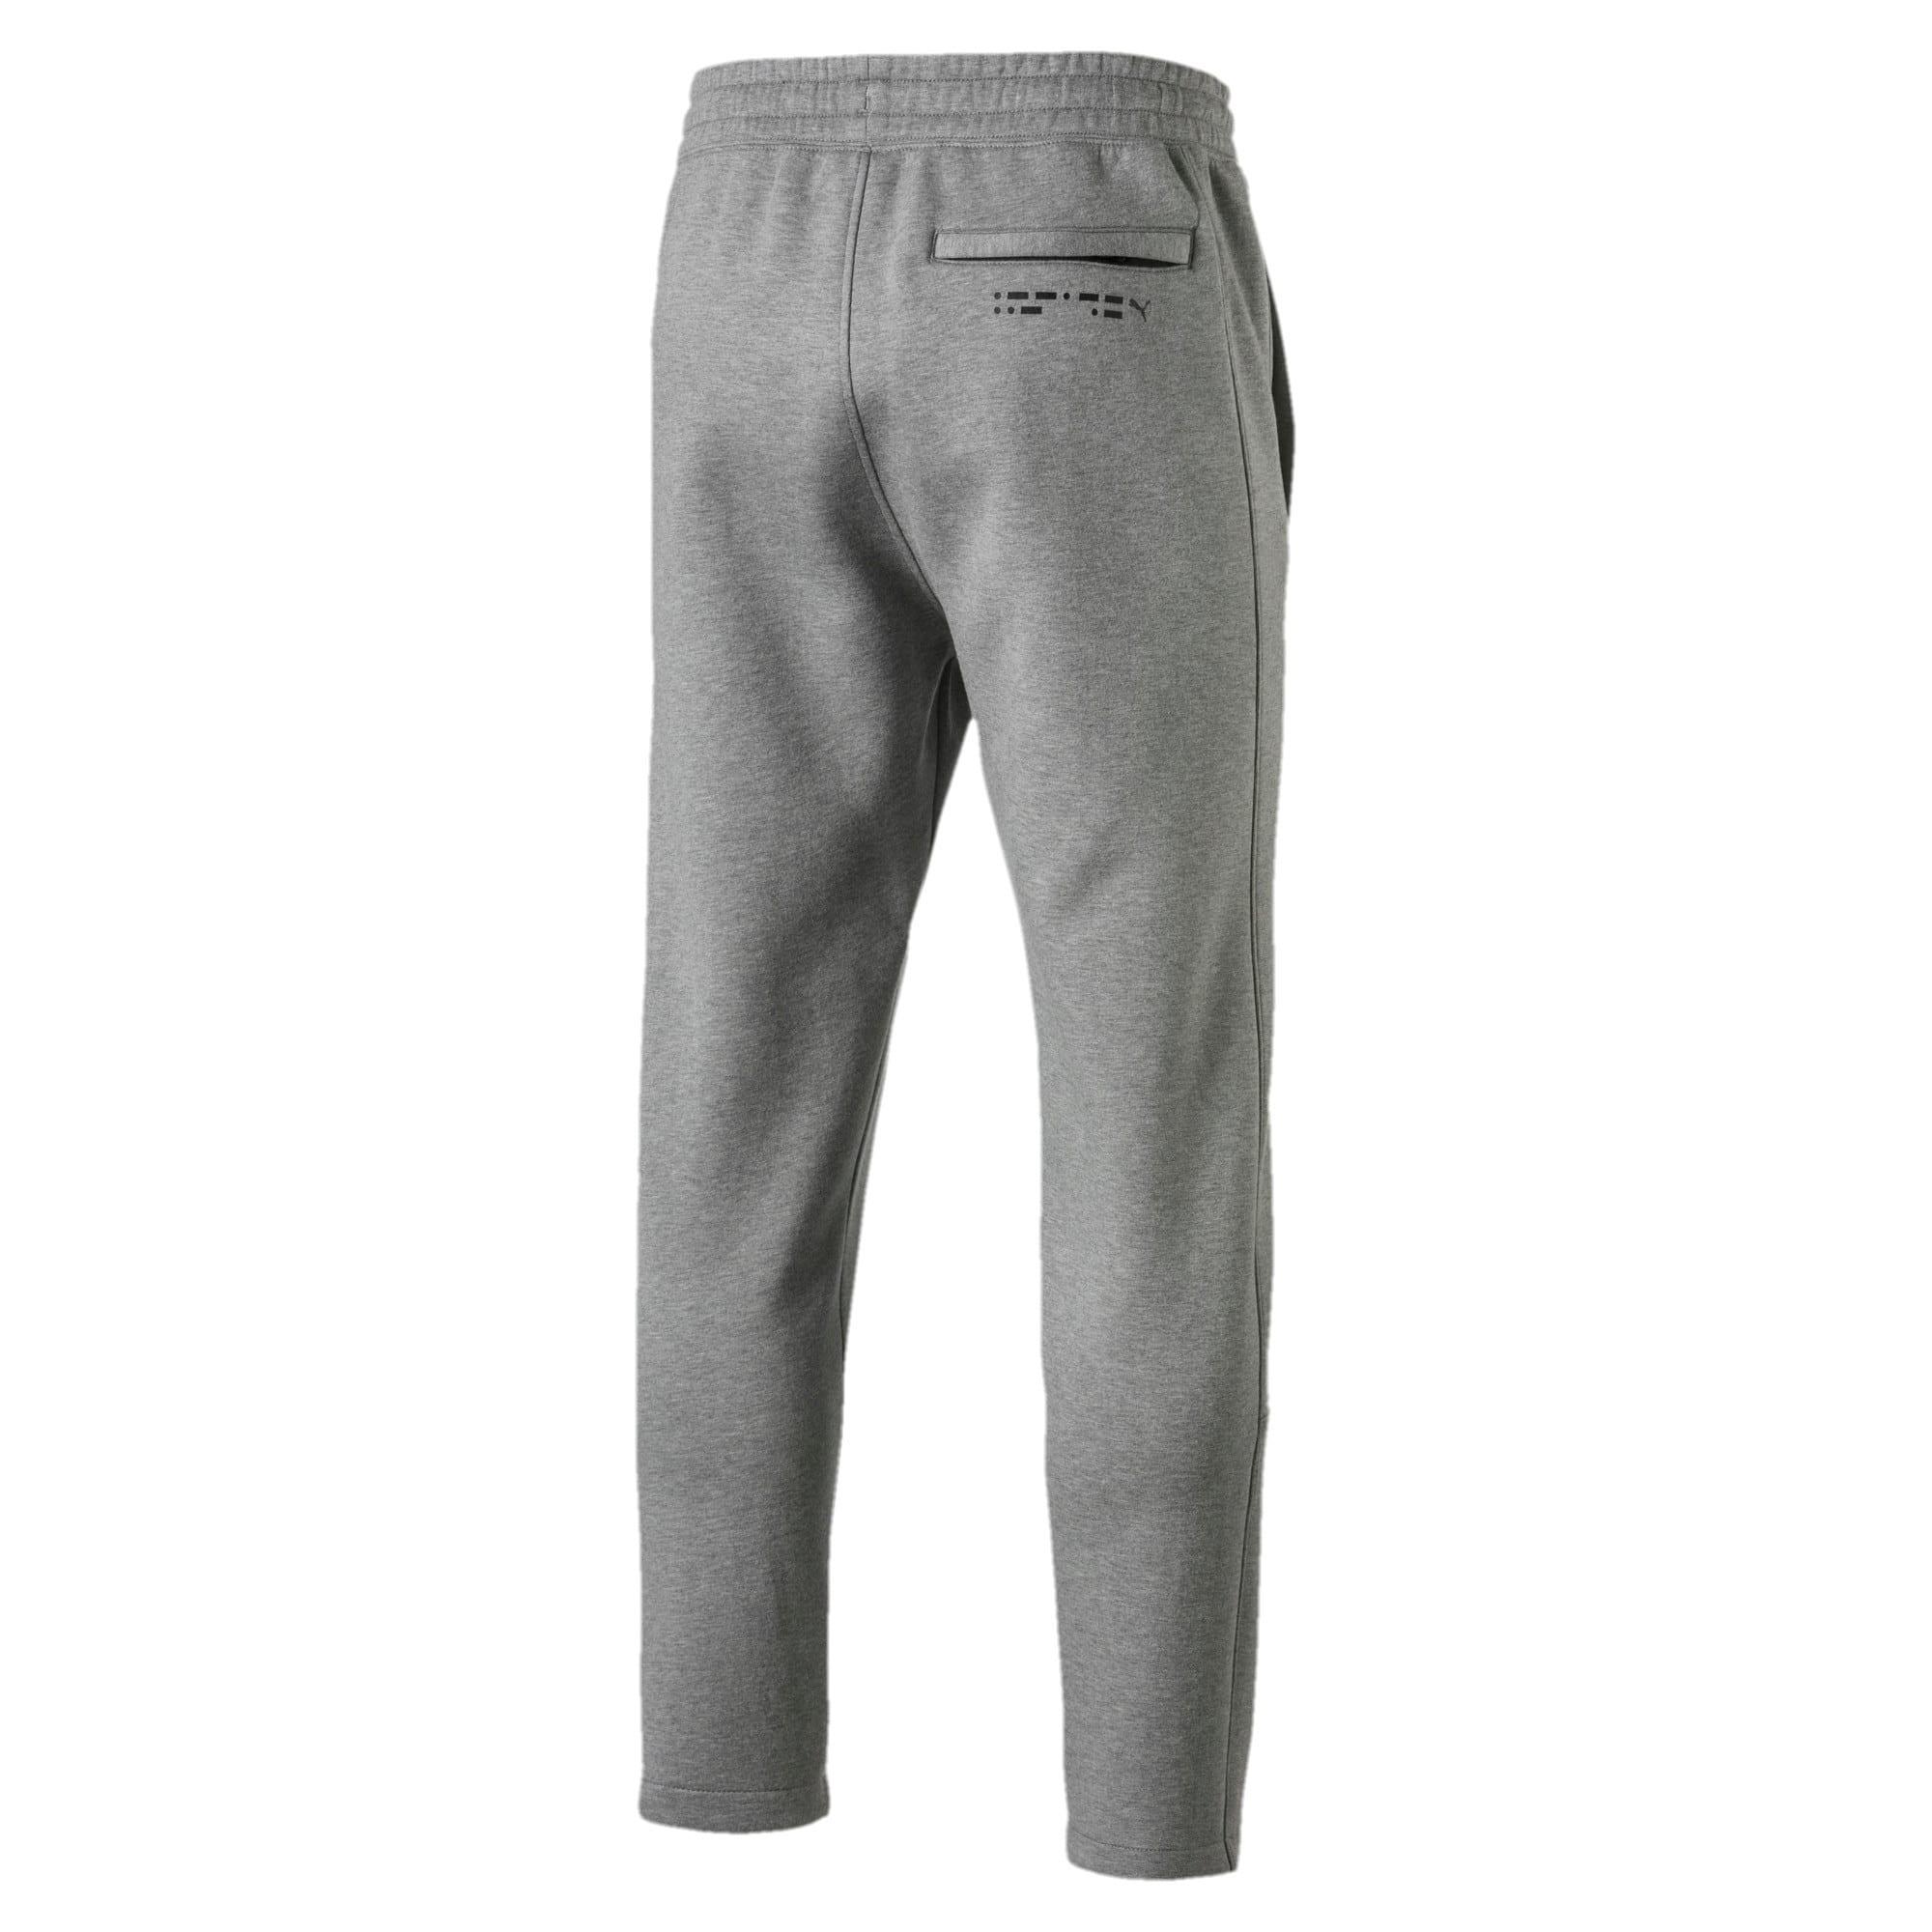 Thumbnail 4 of Epoch Knitted Men's Pants, Medium Gray Heather, medium-IND